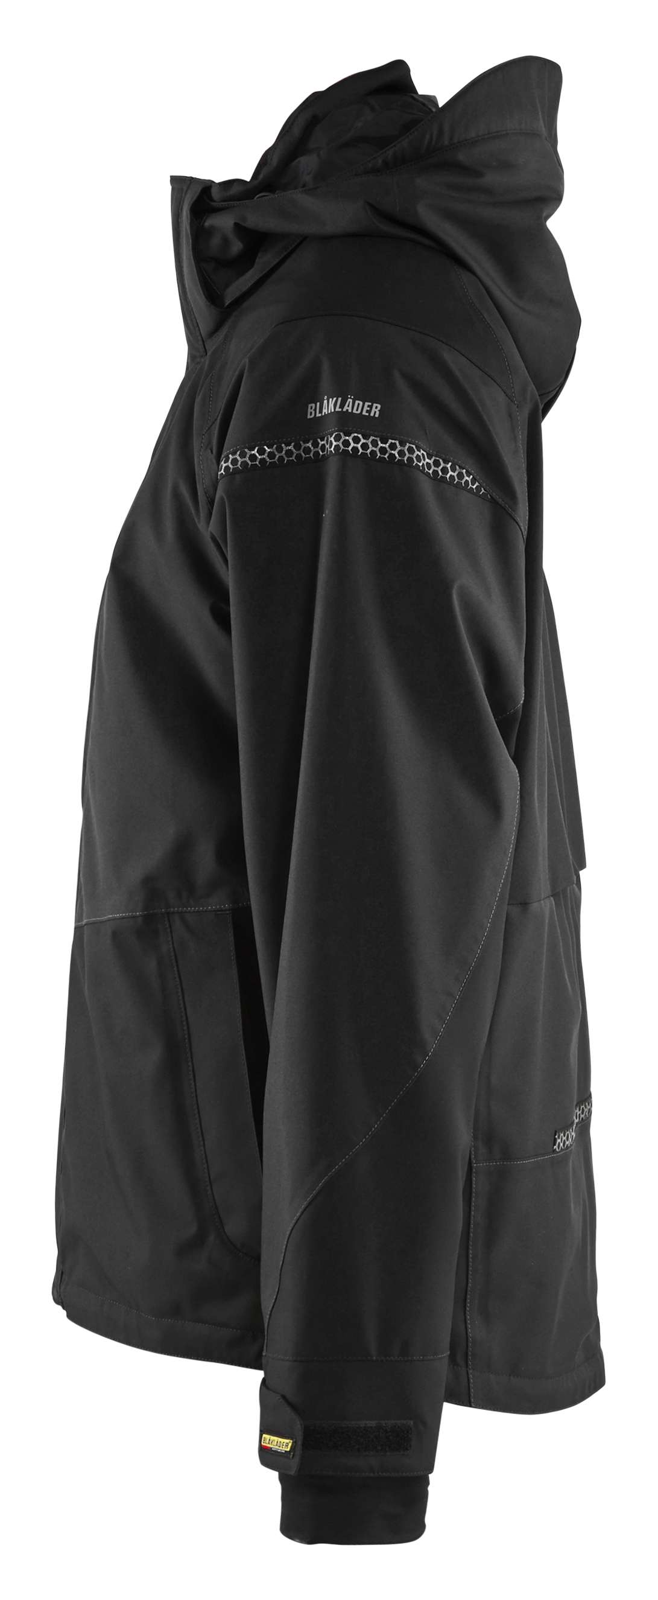 Blaklader Regenjacks 49881987 Stretch zwart(9900)